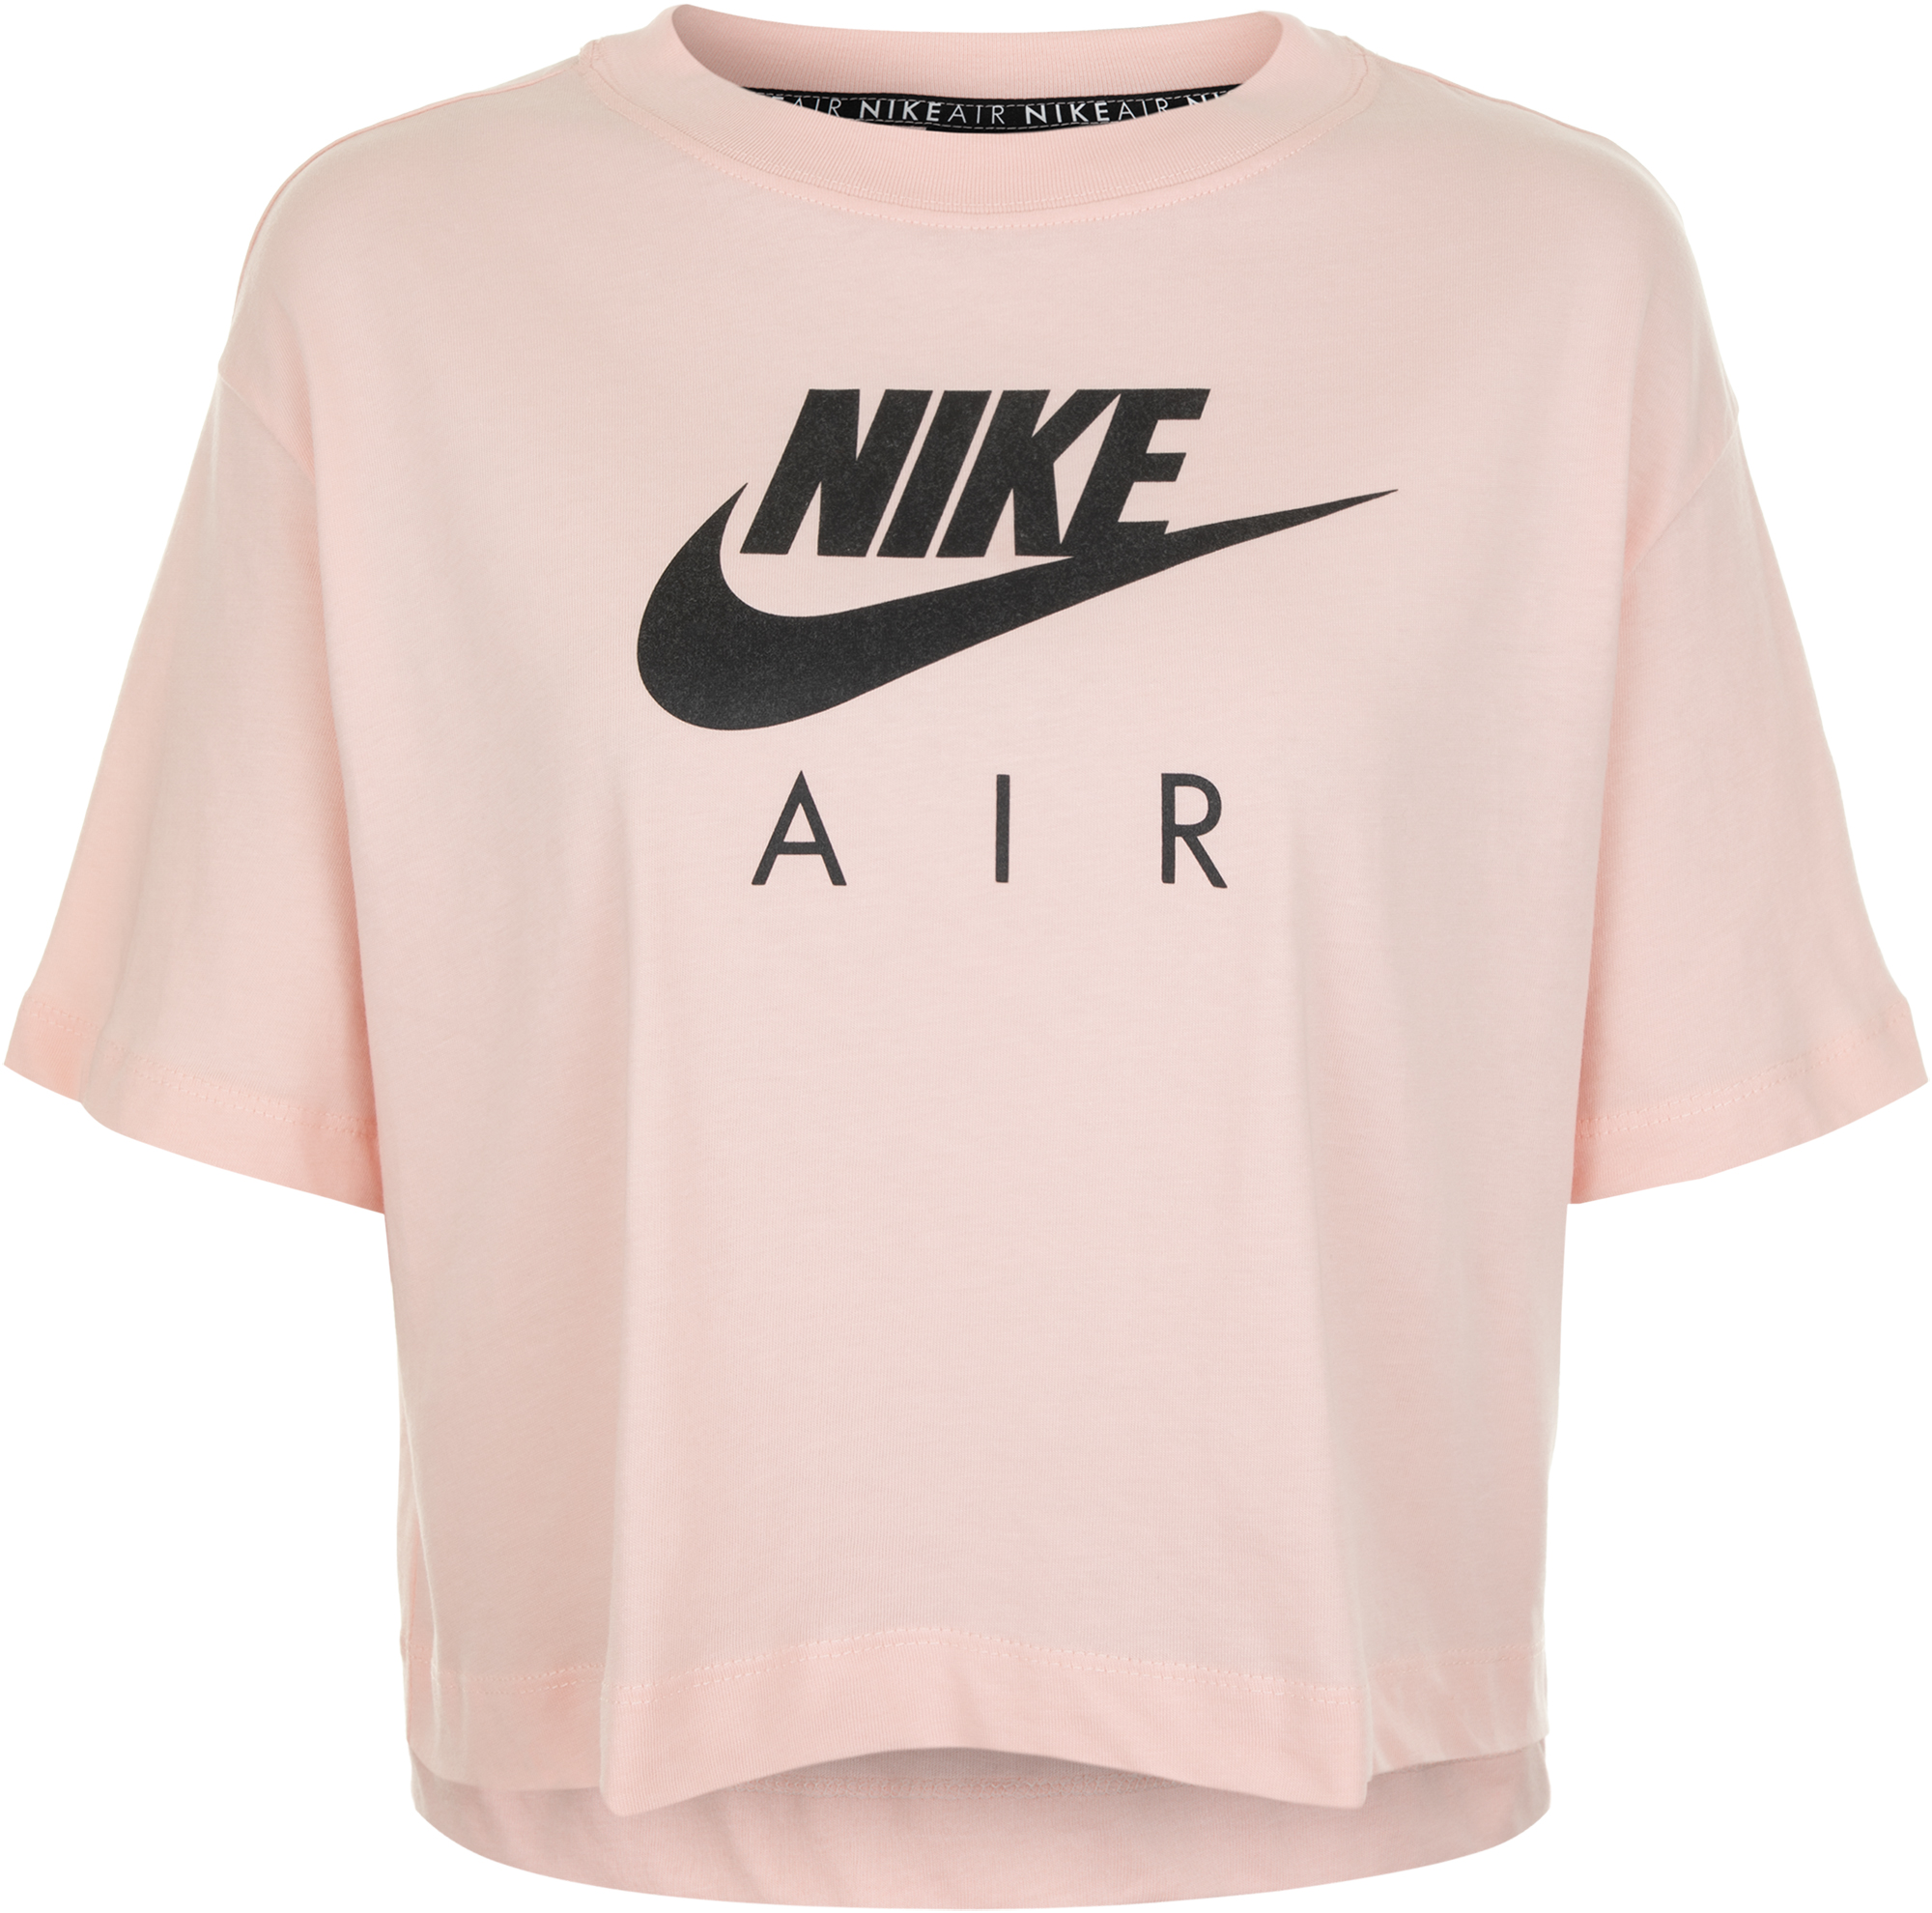 Nike Футболка женская Nike Air, размер 48-50 nike майка женская nike air размер 46 48